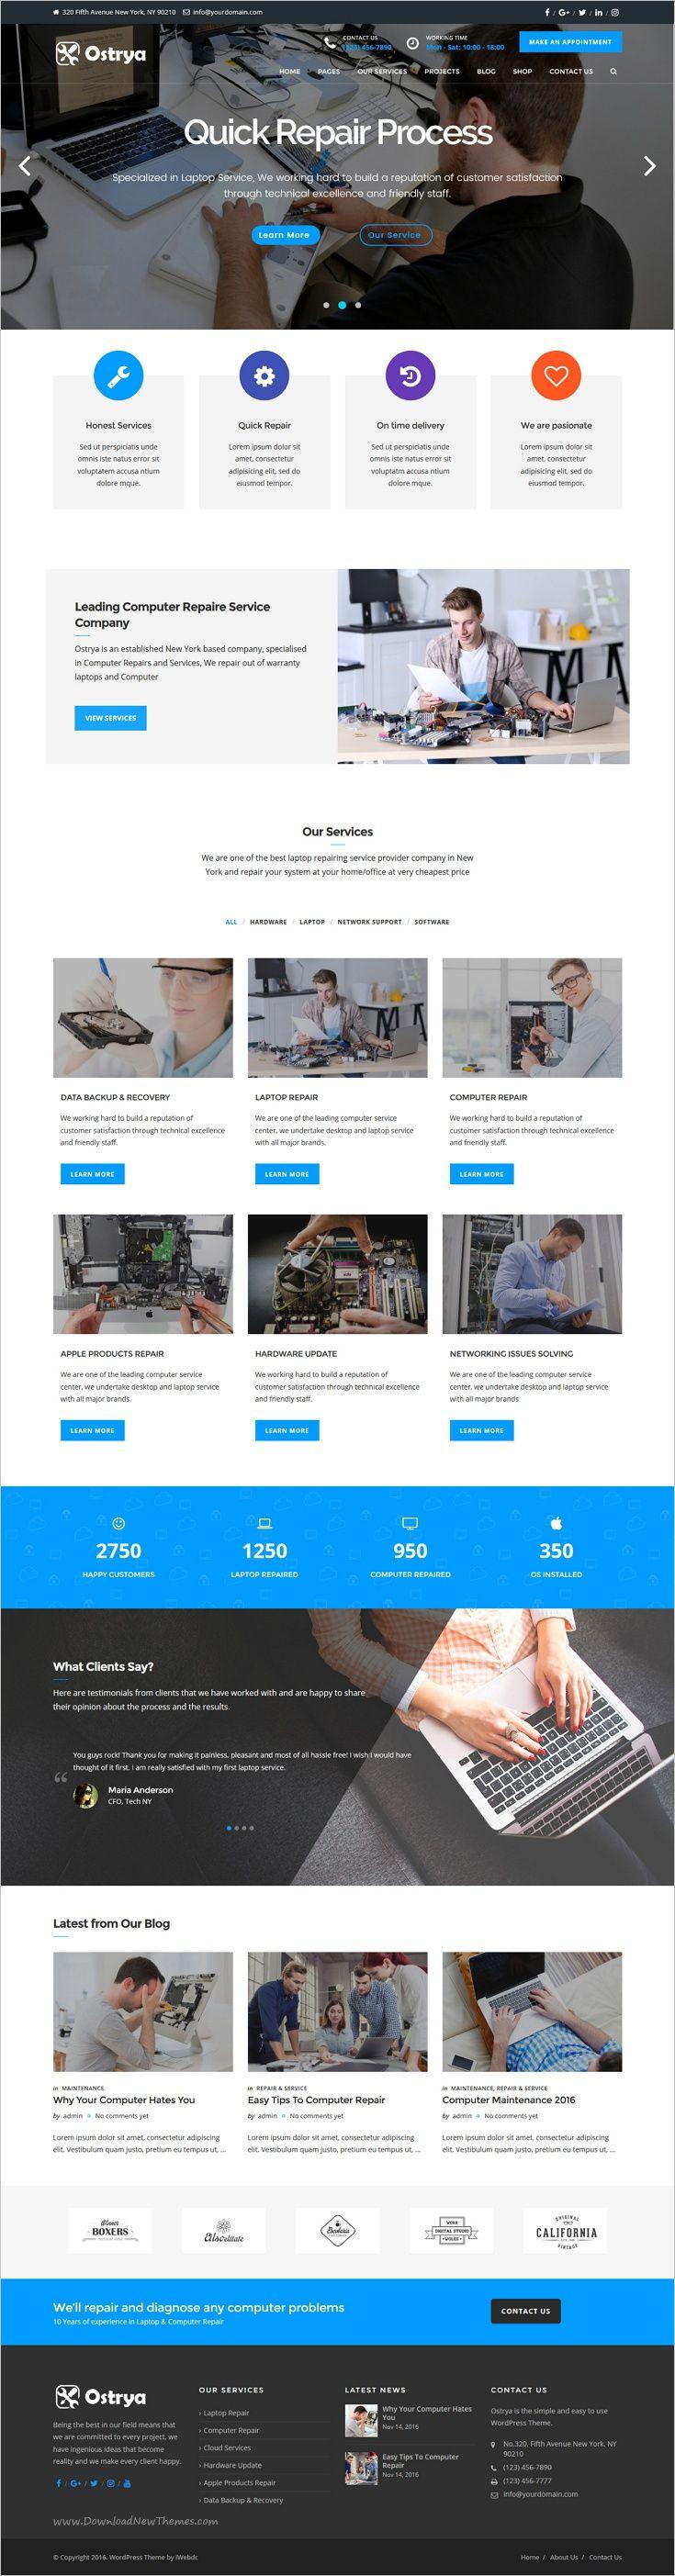 Ostrya is a wonderful 3in1 Premium #WordPress theme designed for #webdev electronics & #Laptop repair #service companies website download now➩ https://themeforest.net/item/ostrya-computer-repair-service-wordpress-theme/18894141?ref=Datasata